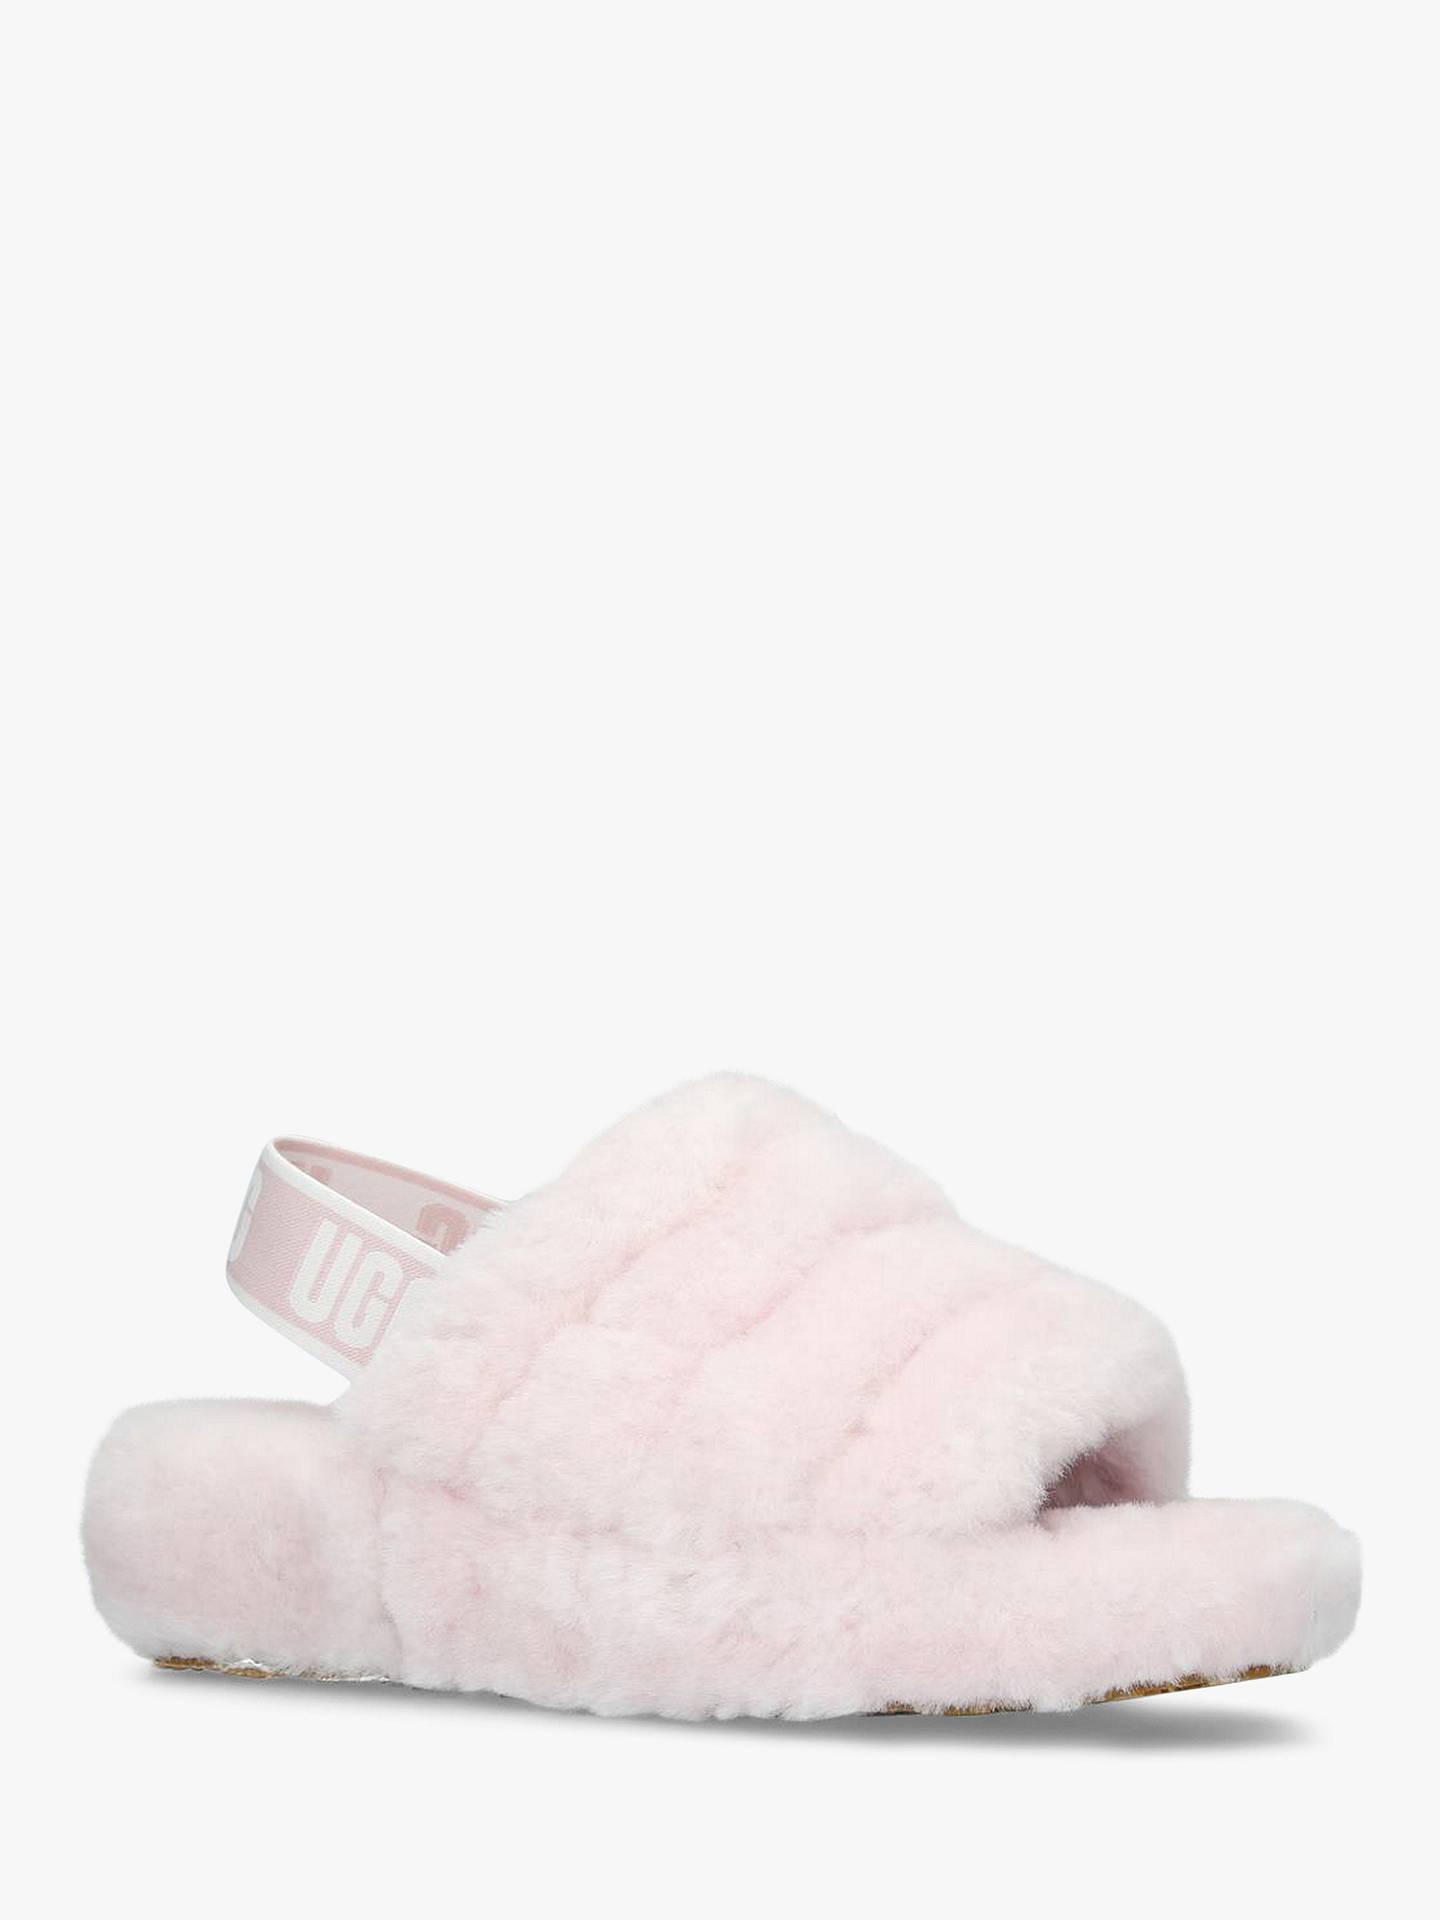 751714723e4 UGG Fluff Yeah Sandals, Pink Sheepskin at John Lewis & Partners